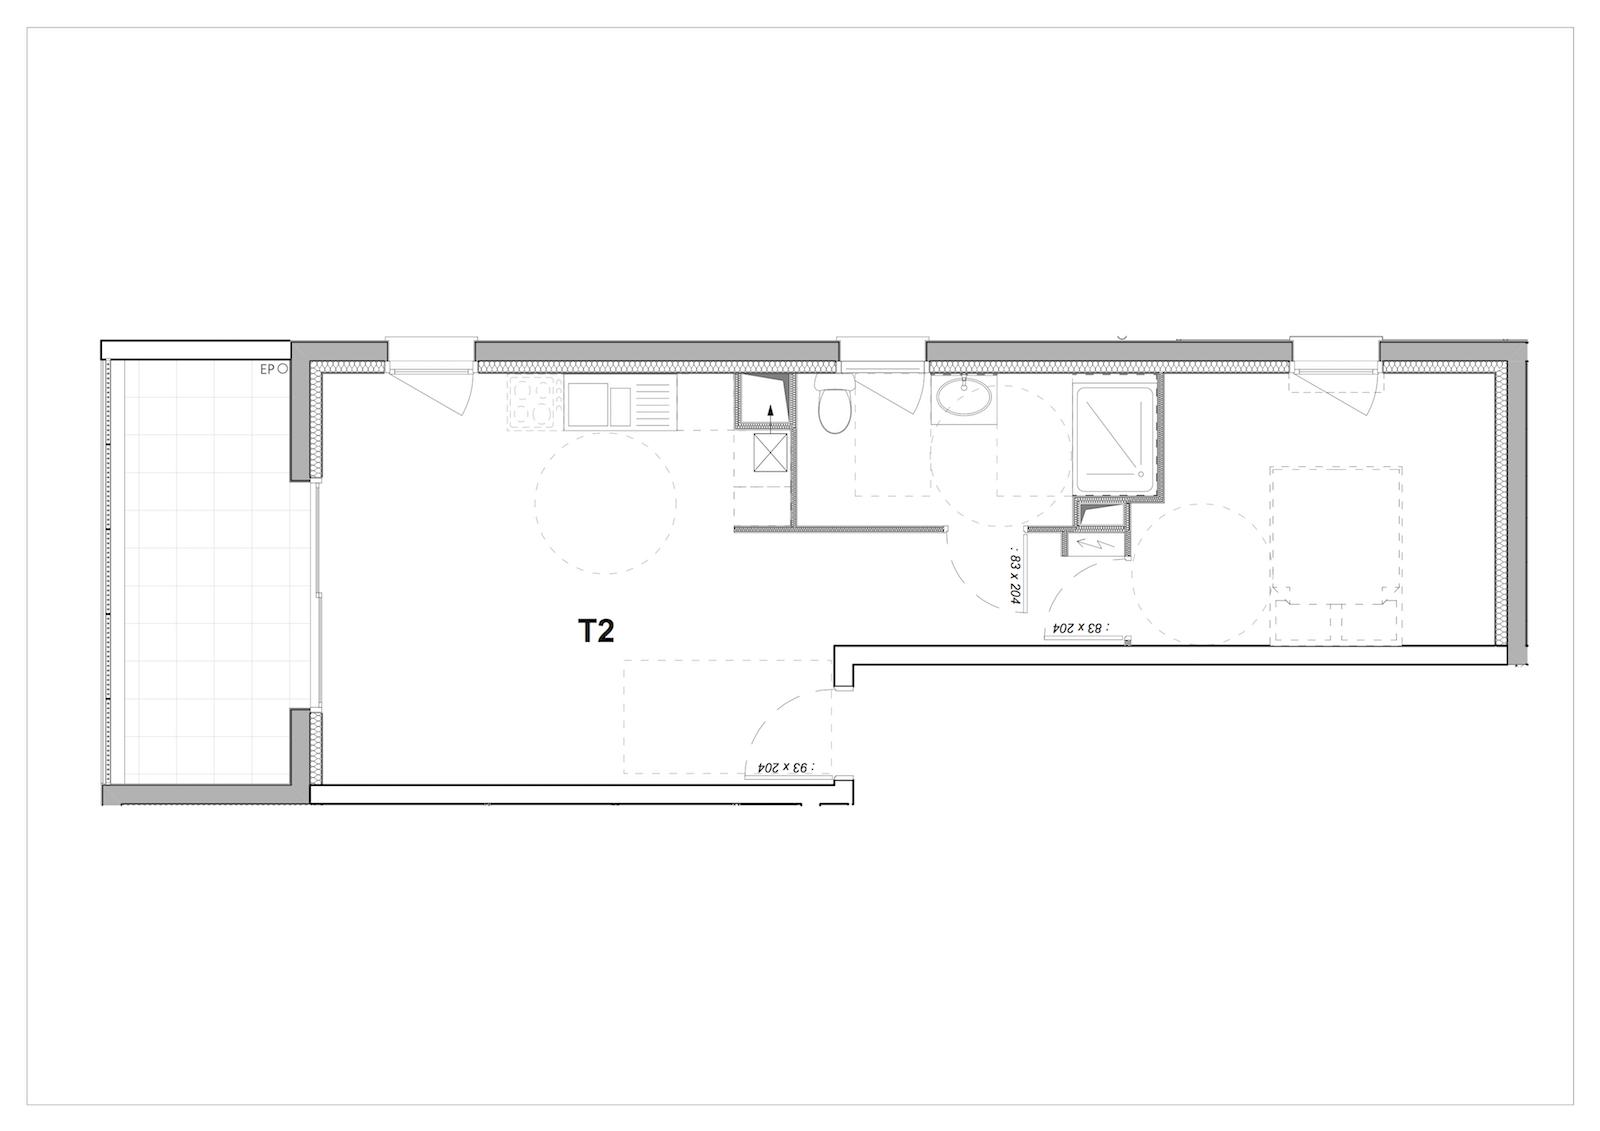 Acheter-Appartement-T2-neuf-achat-anglet-biarritz-alentours-clos-d-ainara-maneo-habitat